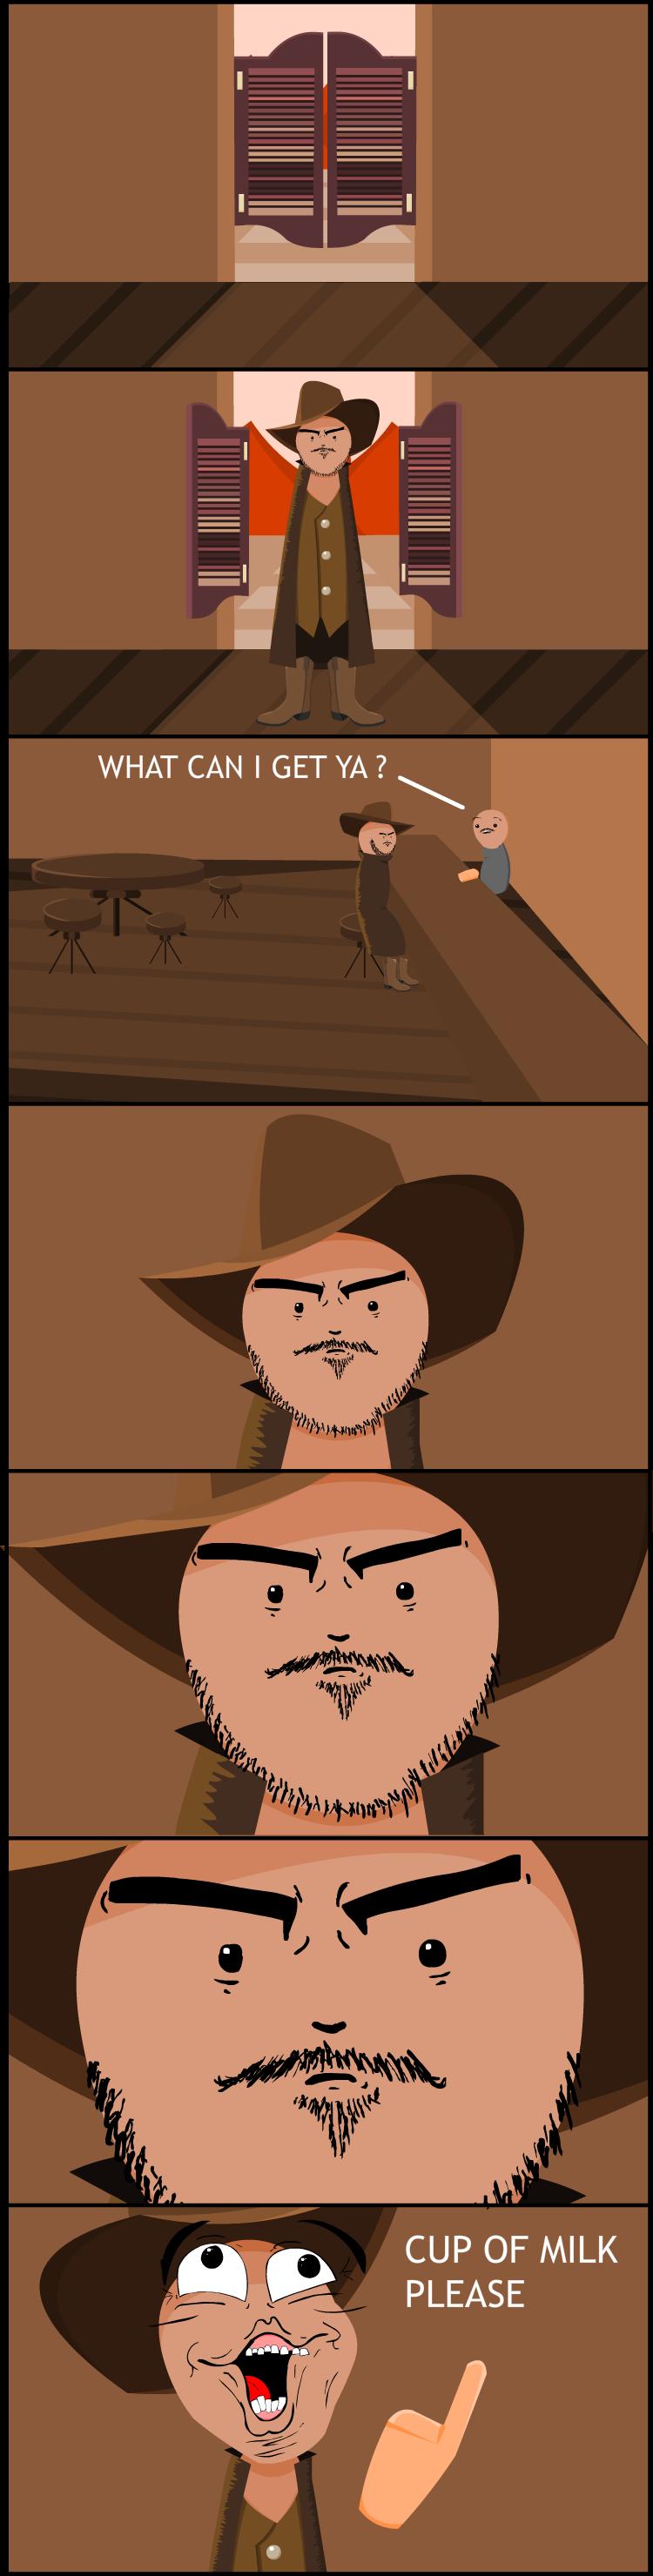 Cowboy in the bar